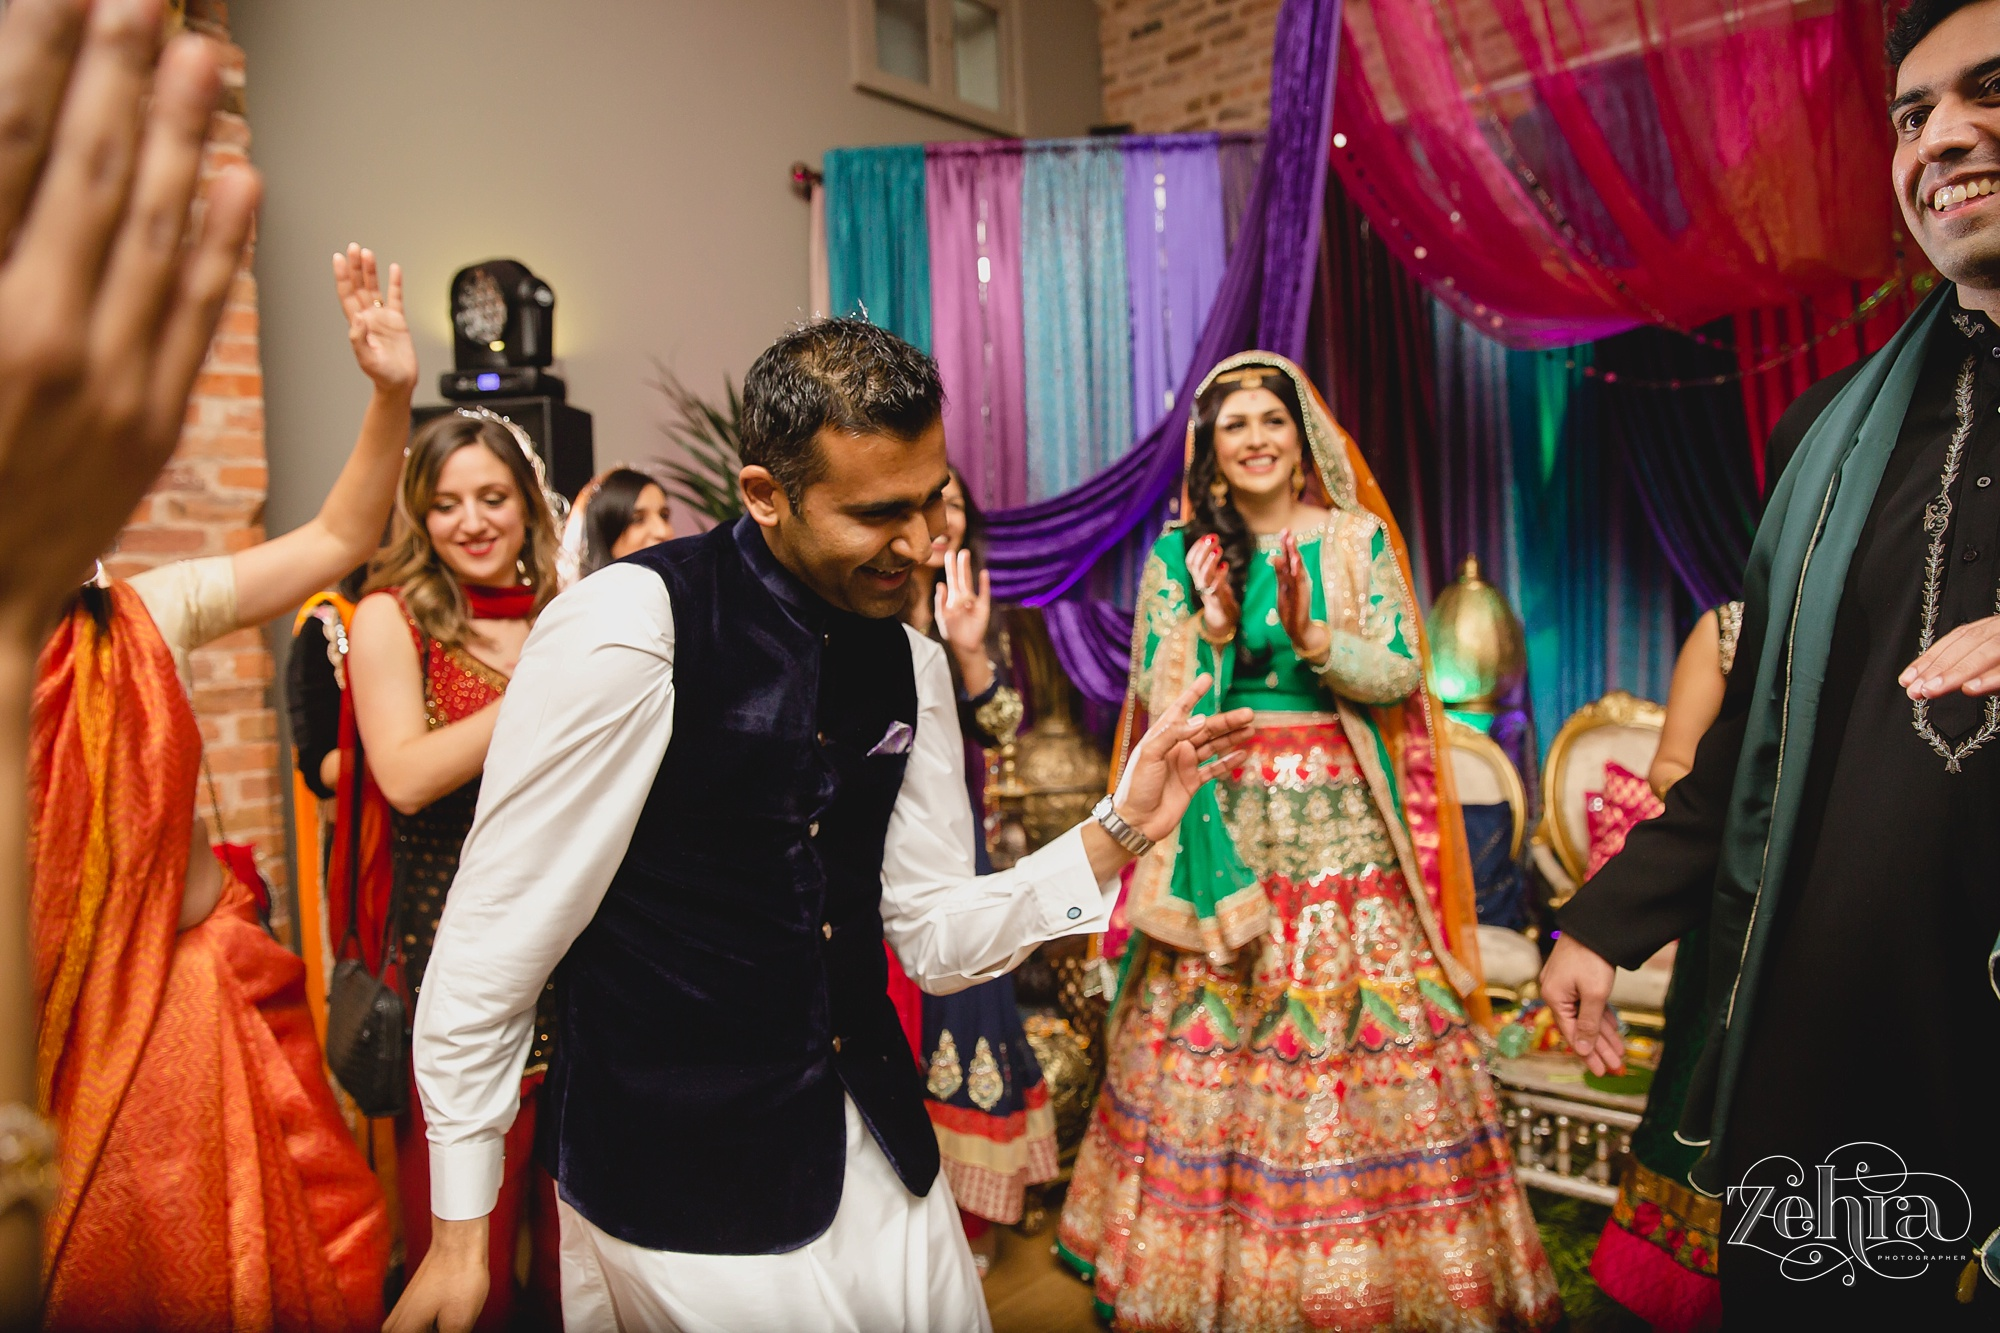 zehra wedding photographer arley hall cheshire044.jpg